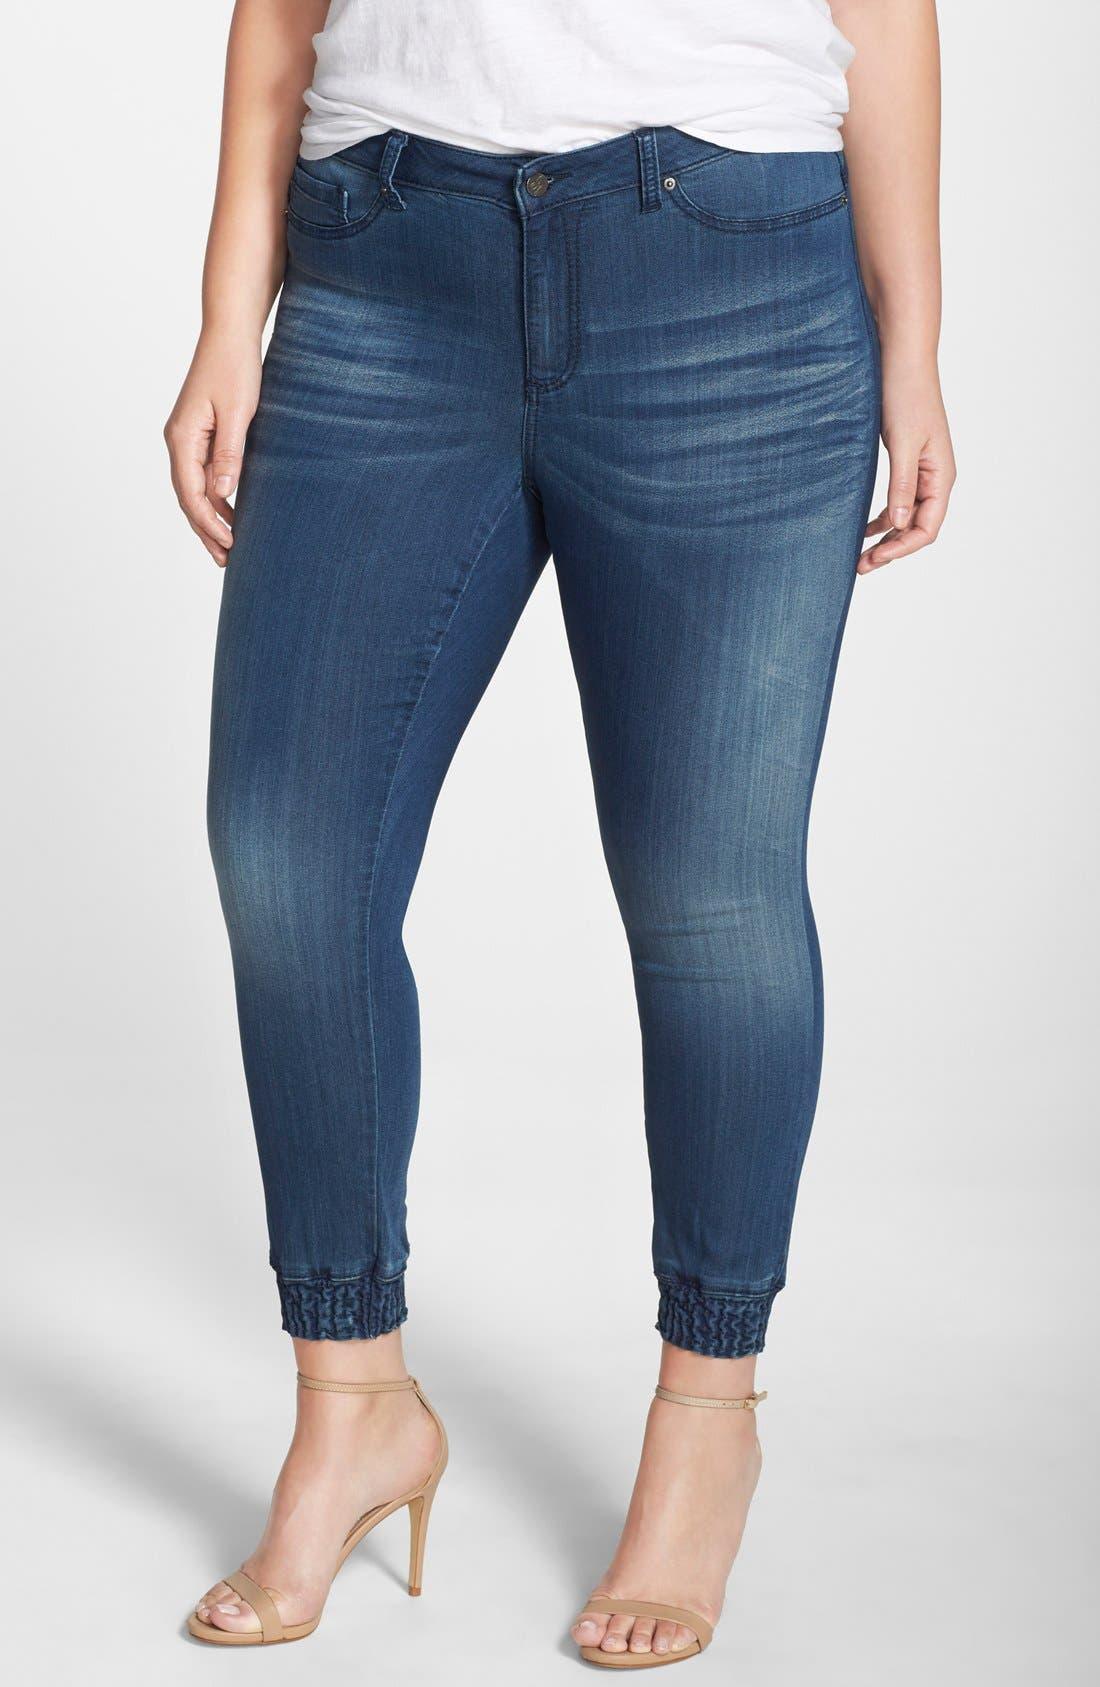 Poetic Justice 'Suzzie' Stretch Knit Denim Crop Jeans (Plus Size)